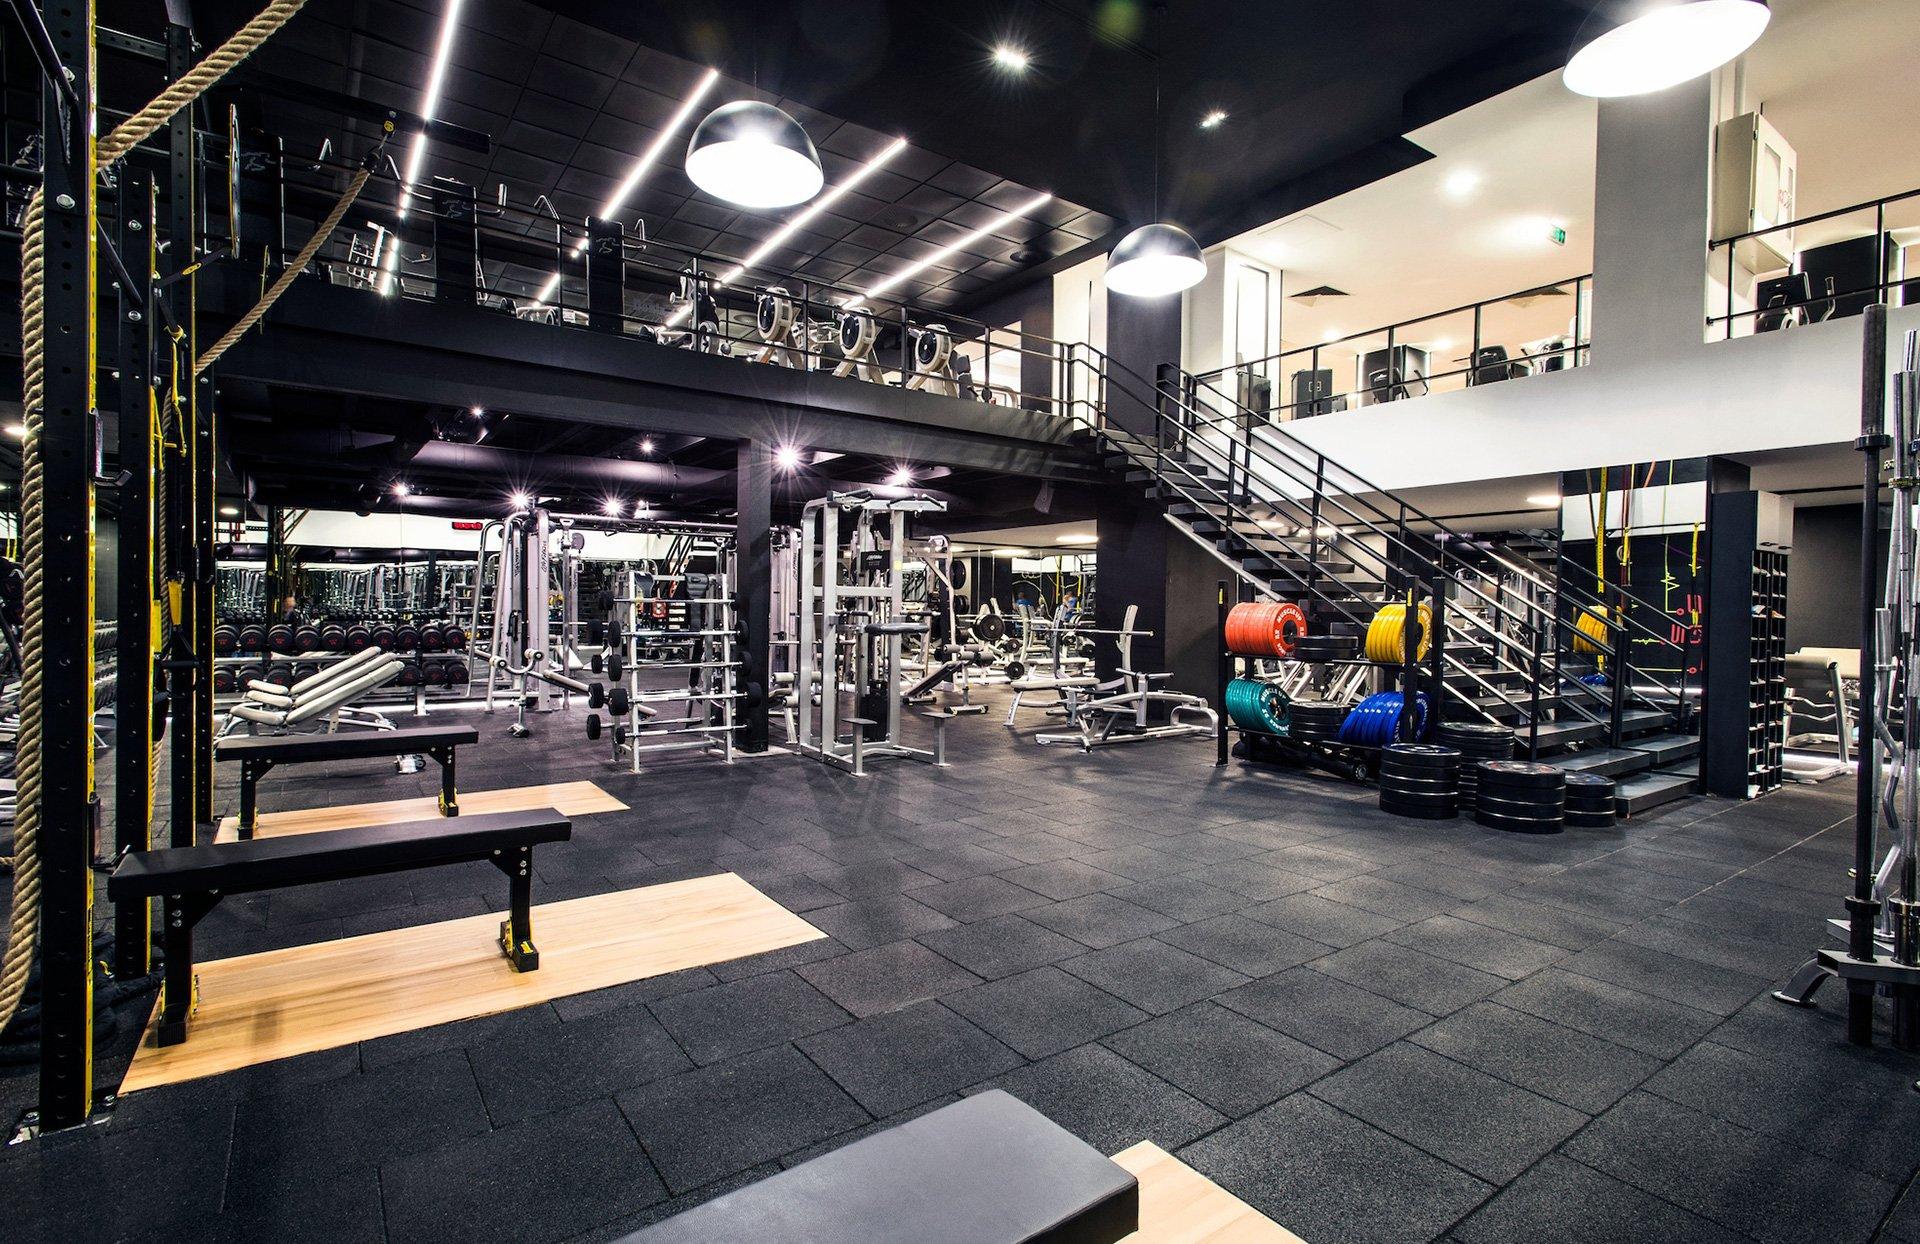 Macfit spor salonu at gym - 3 2